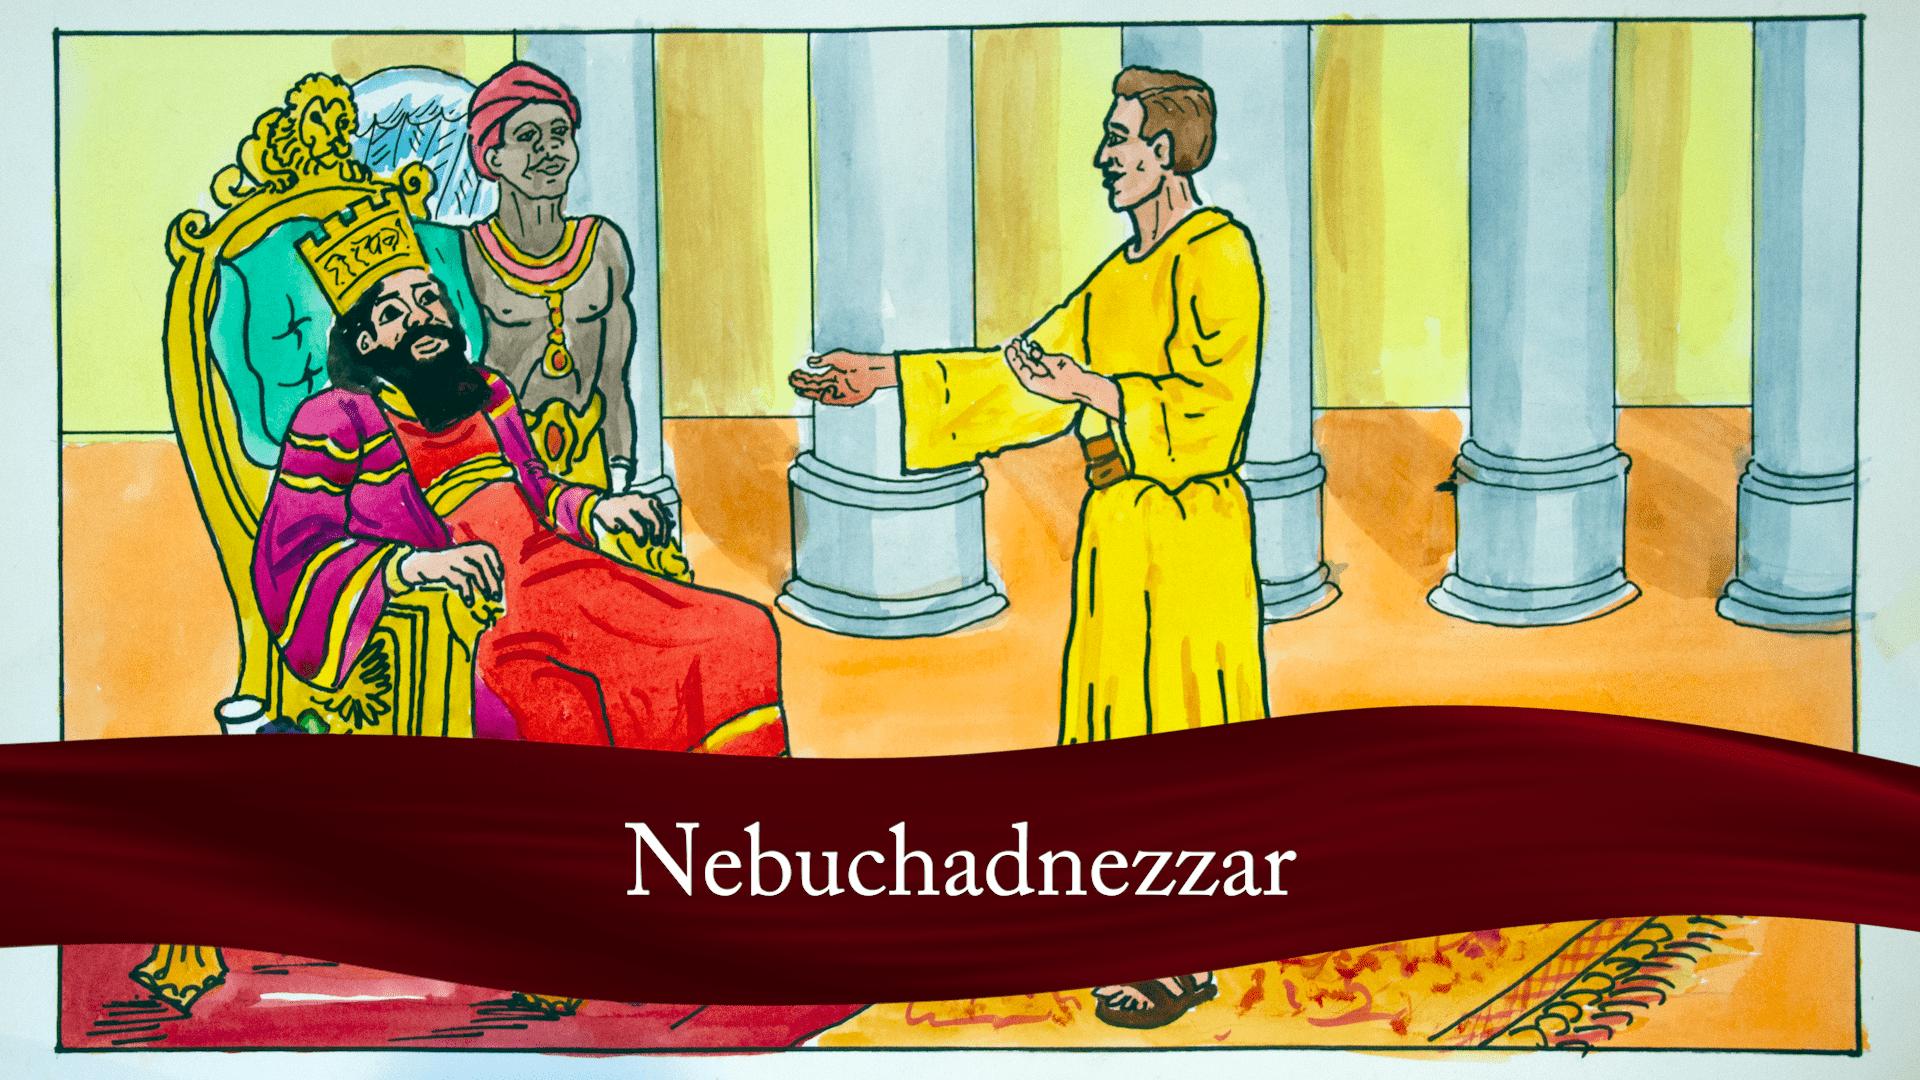 Nebuchadnezzarr